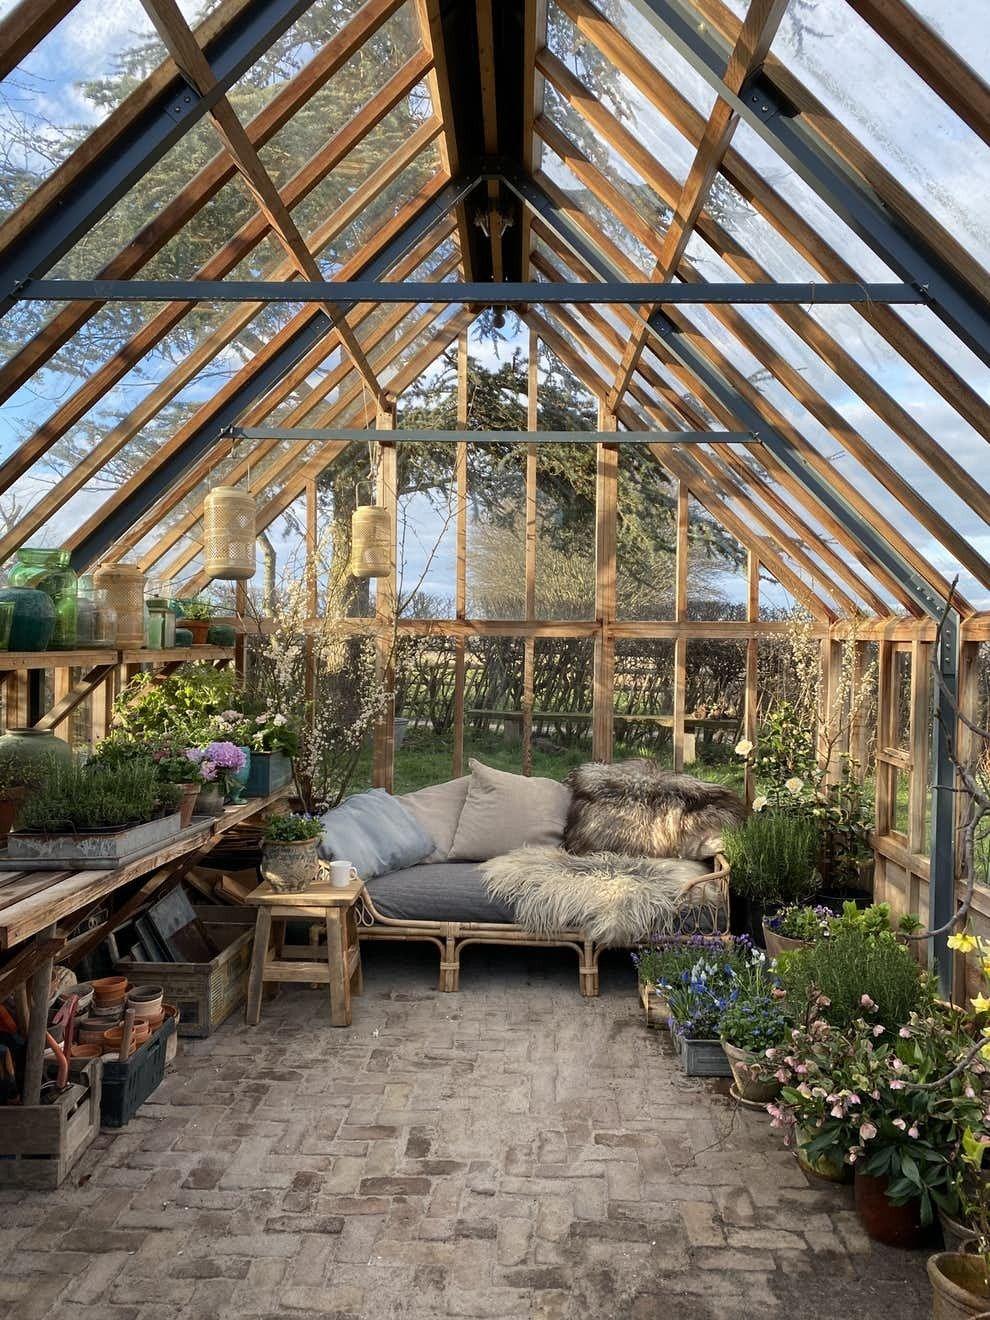 Pin By Diana Castillo Osorio On Have Backyard Greenhouse Backyard Garden Design Backyard greenhouse in minnesota